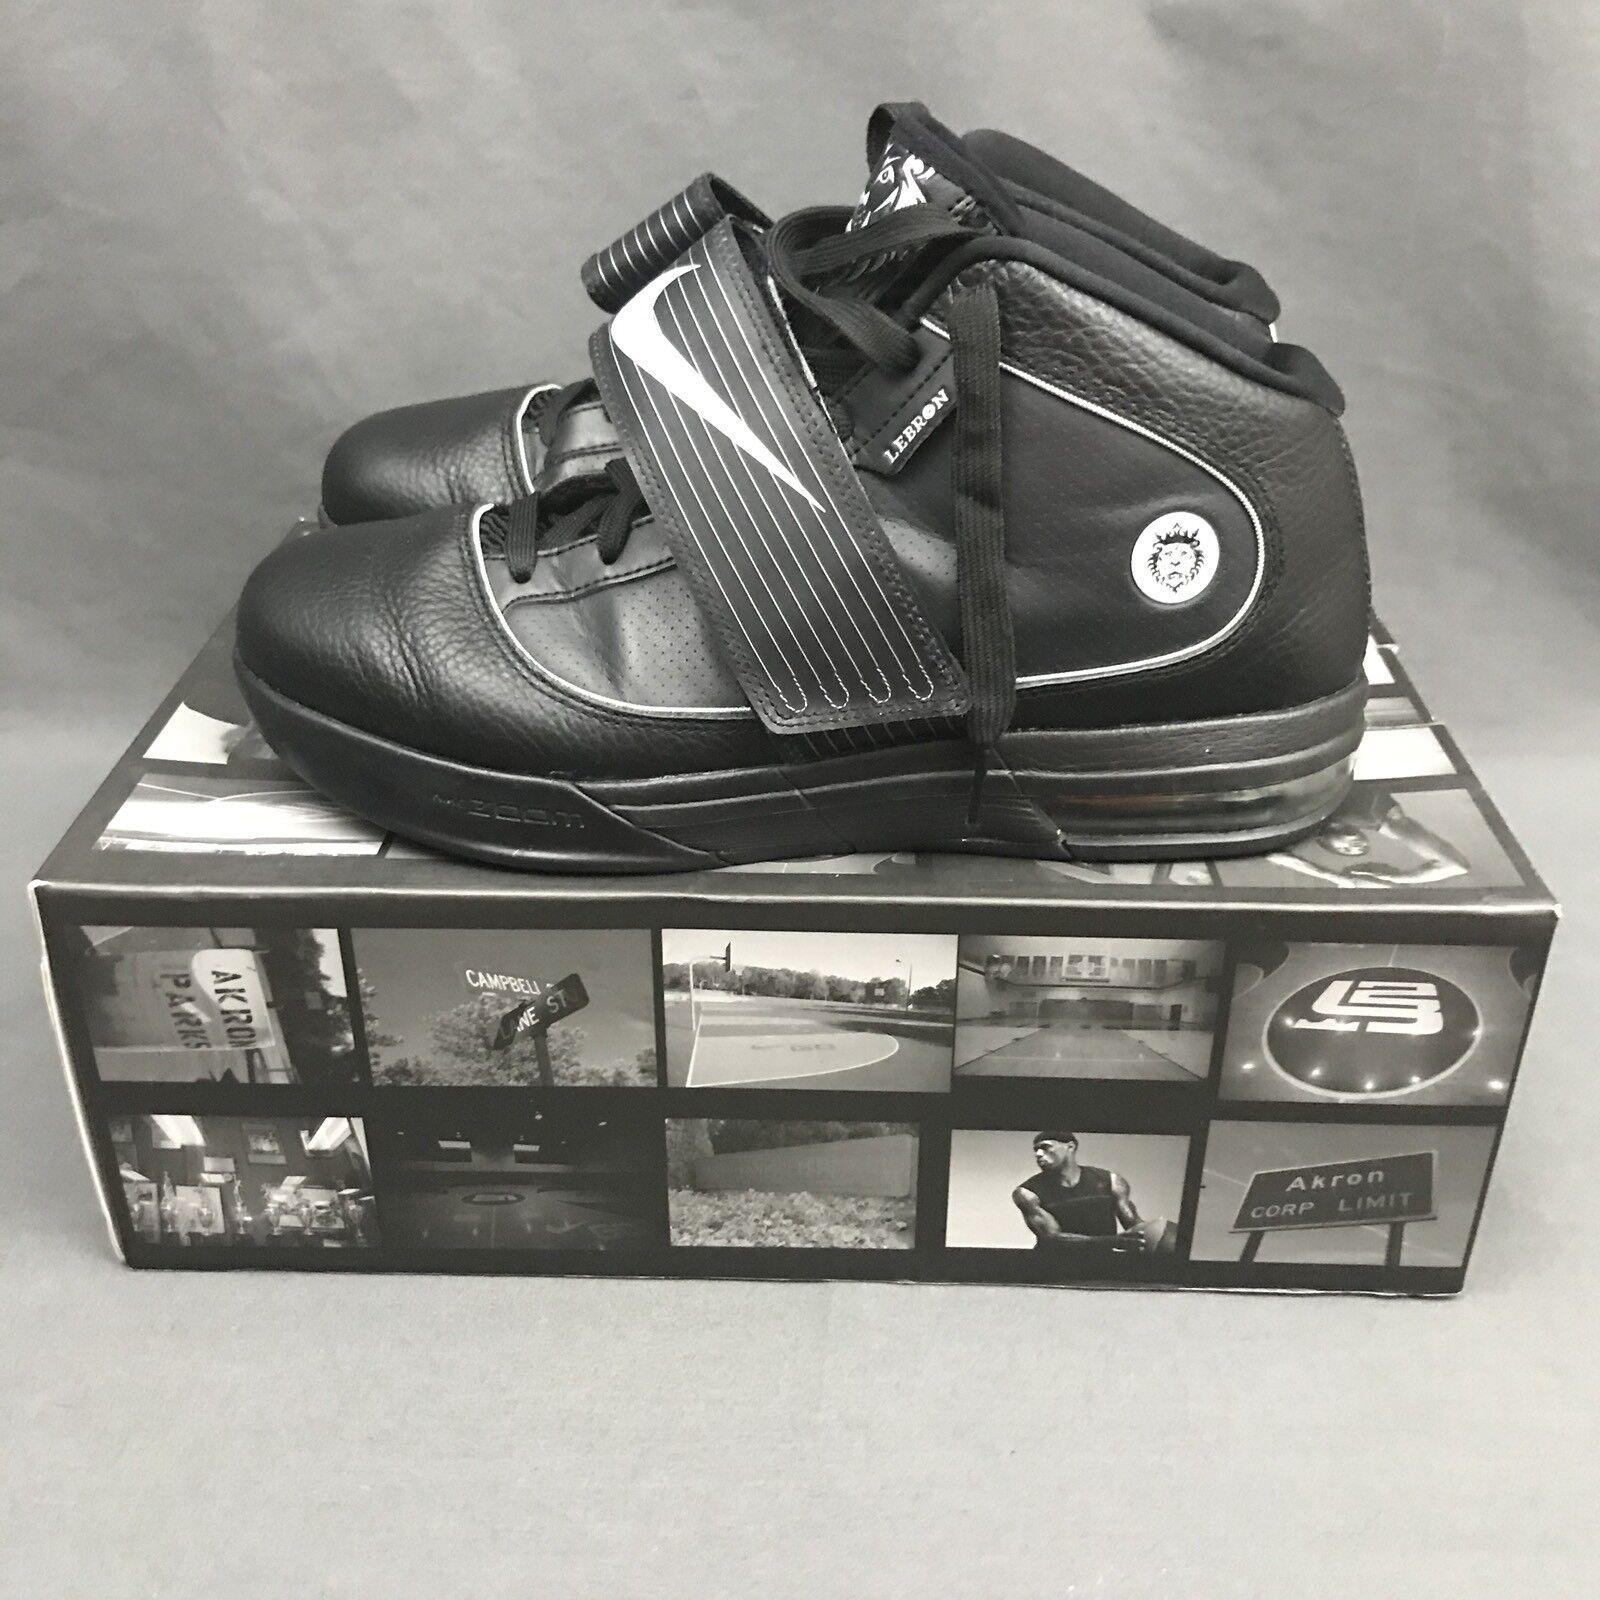 Nike Zoom Soldier IV TB 2018 Black Sneakers 407630 001 Comfortable  Seasonal price cuts, discount benefits